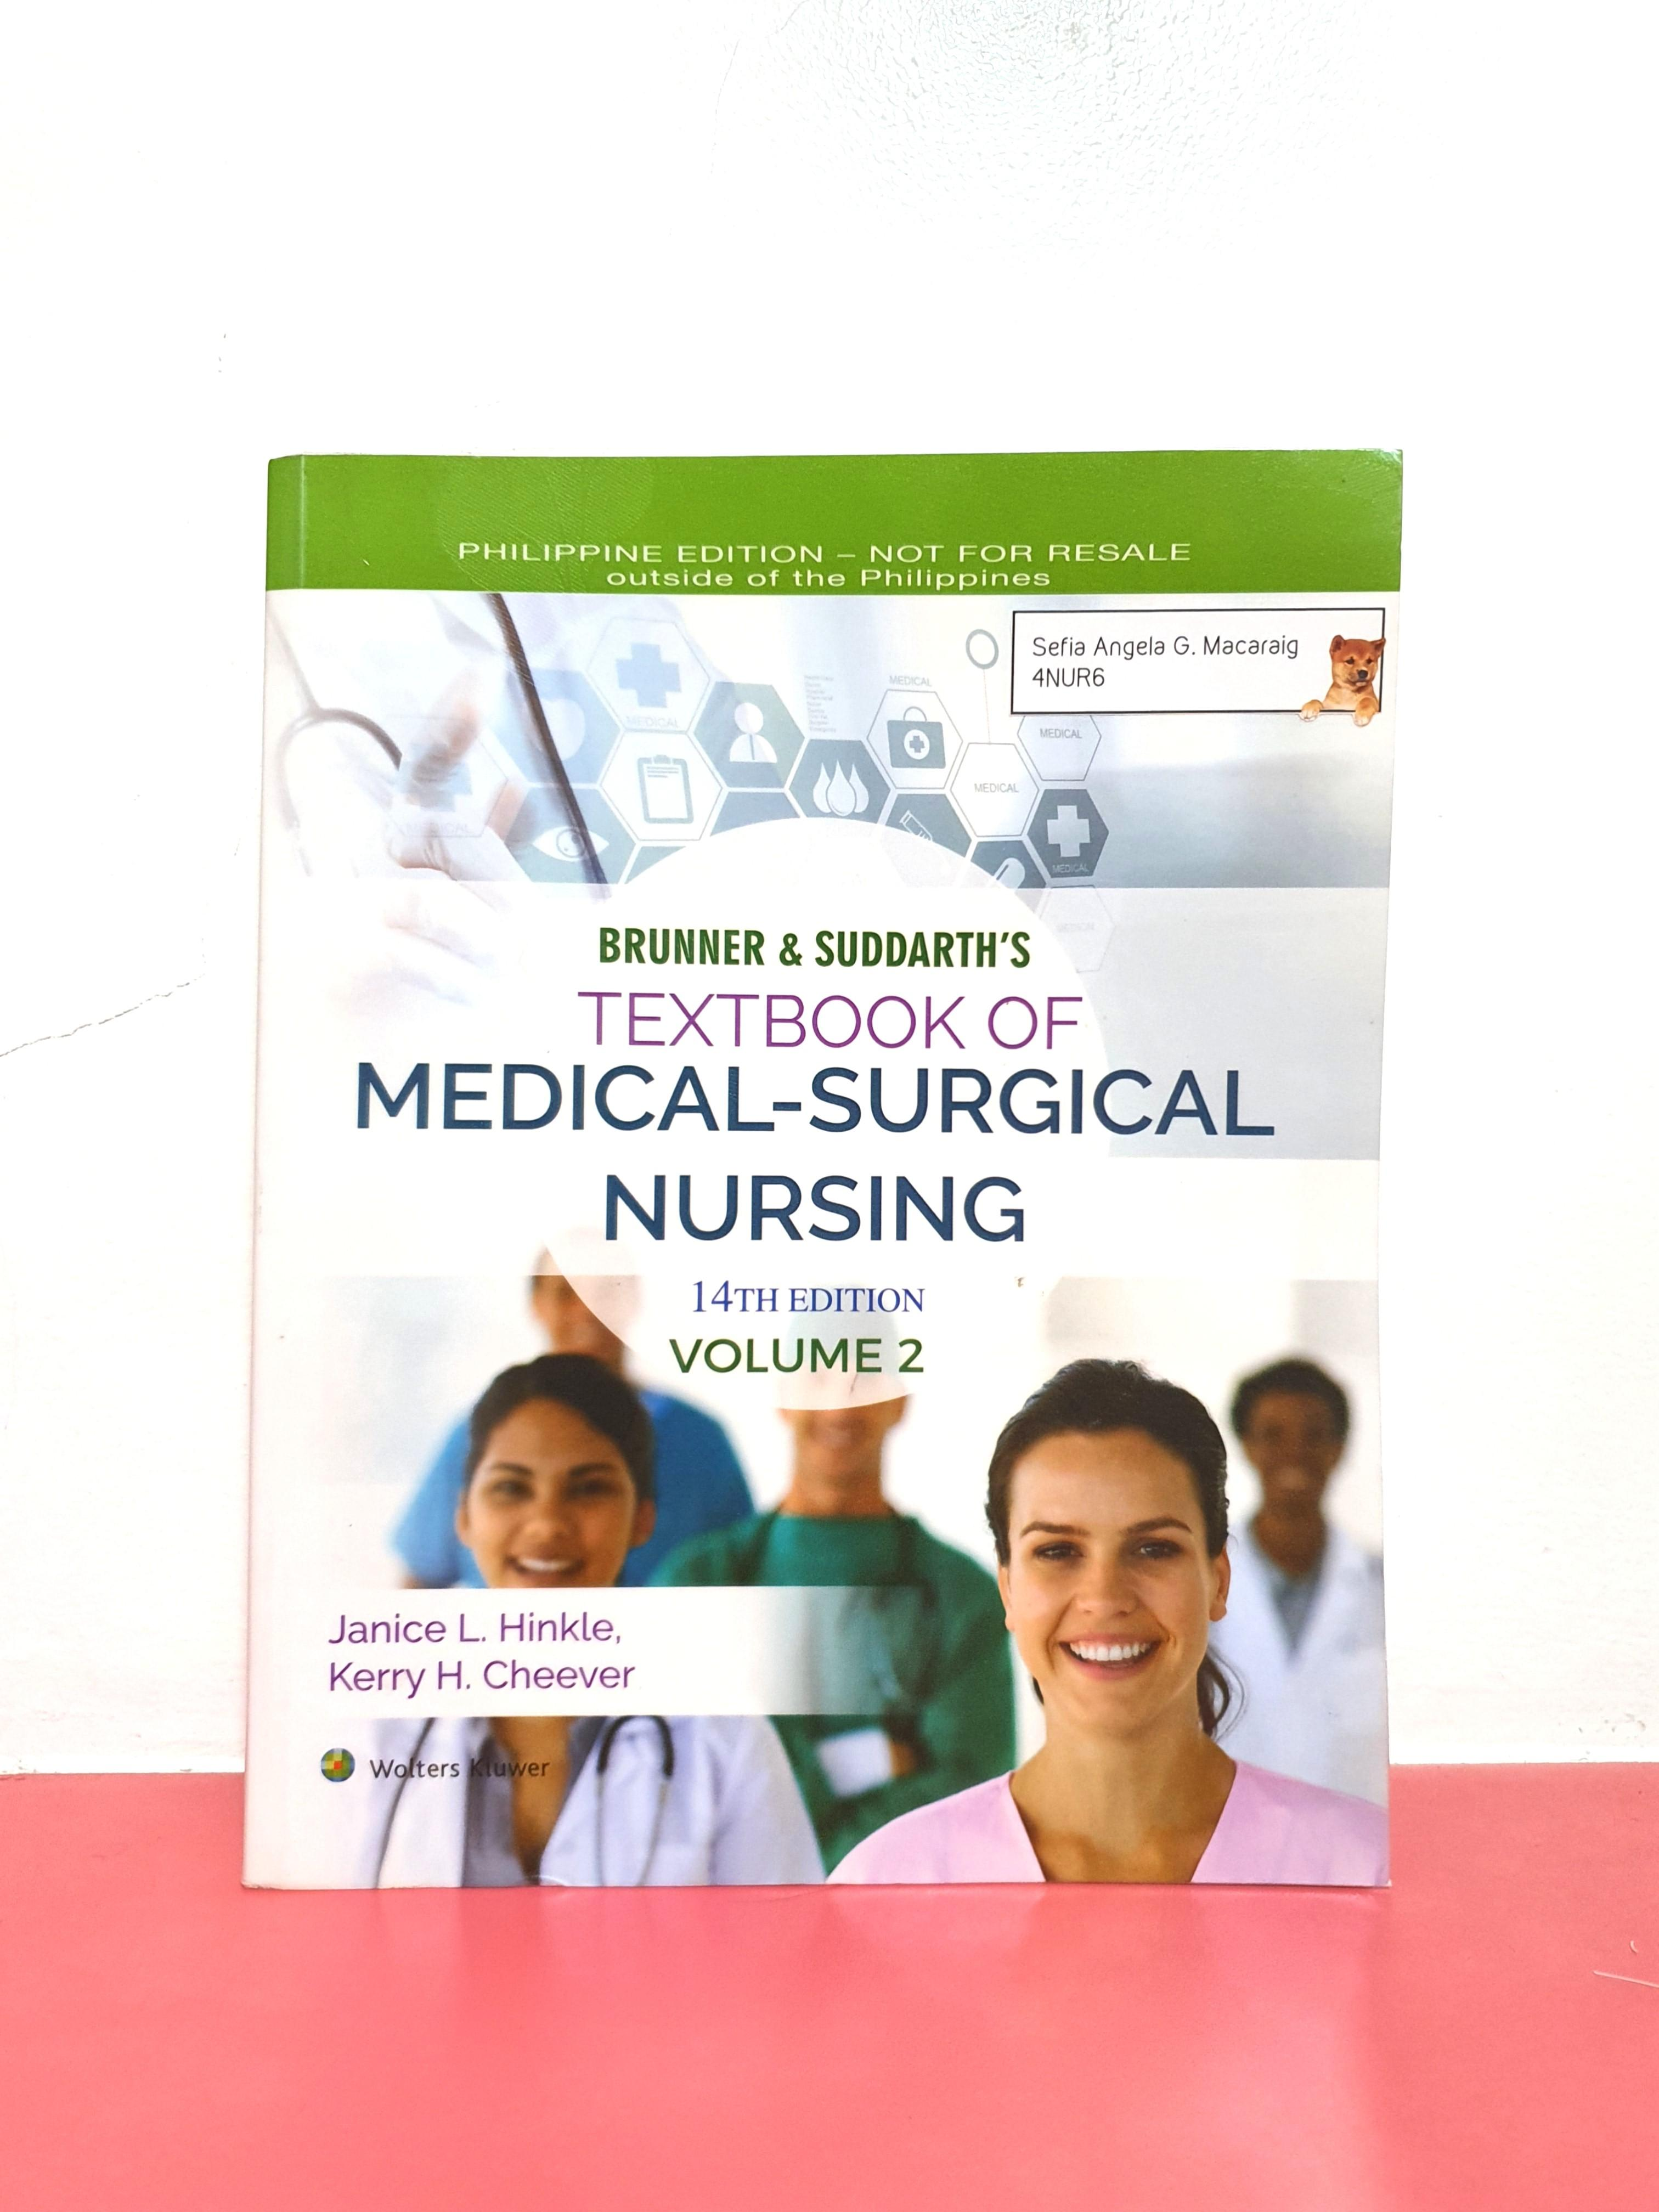 Brunner & Suddarth's Textbook of Medical Surgical Nursing Volume 1-2 (14th ed.)